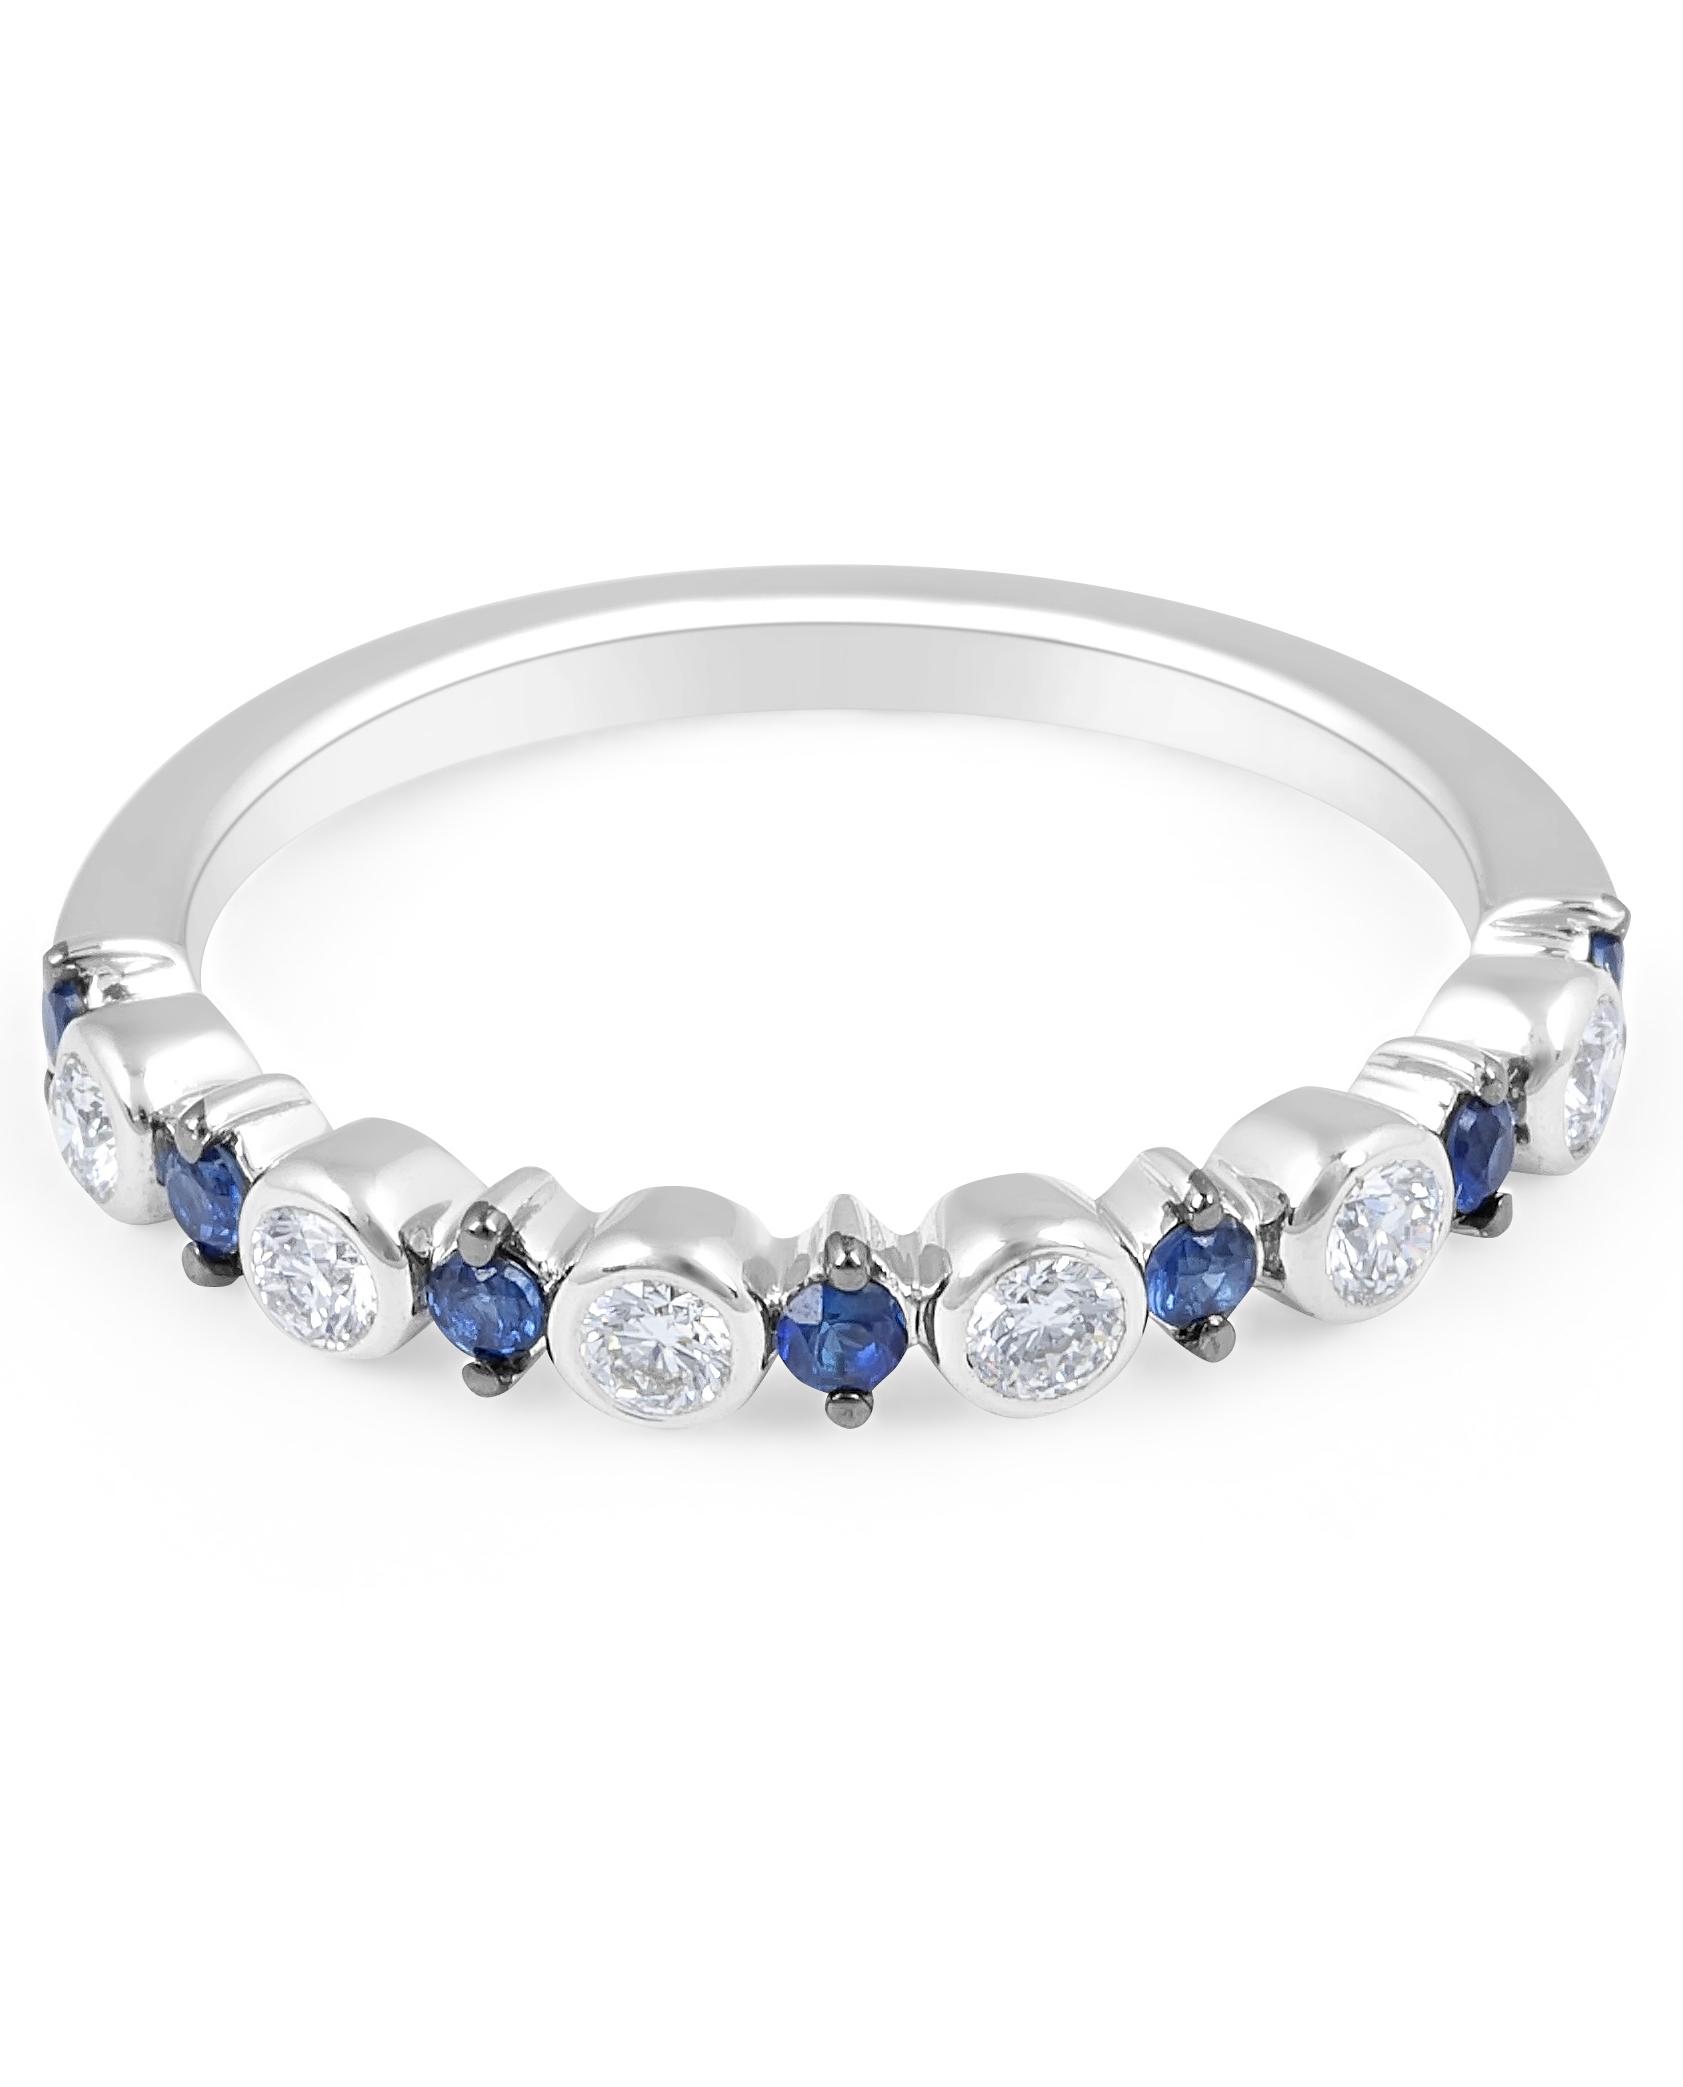 Sapphire Diamond Band in 18 Karat White Gold - mens wedding band